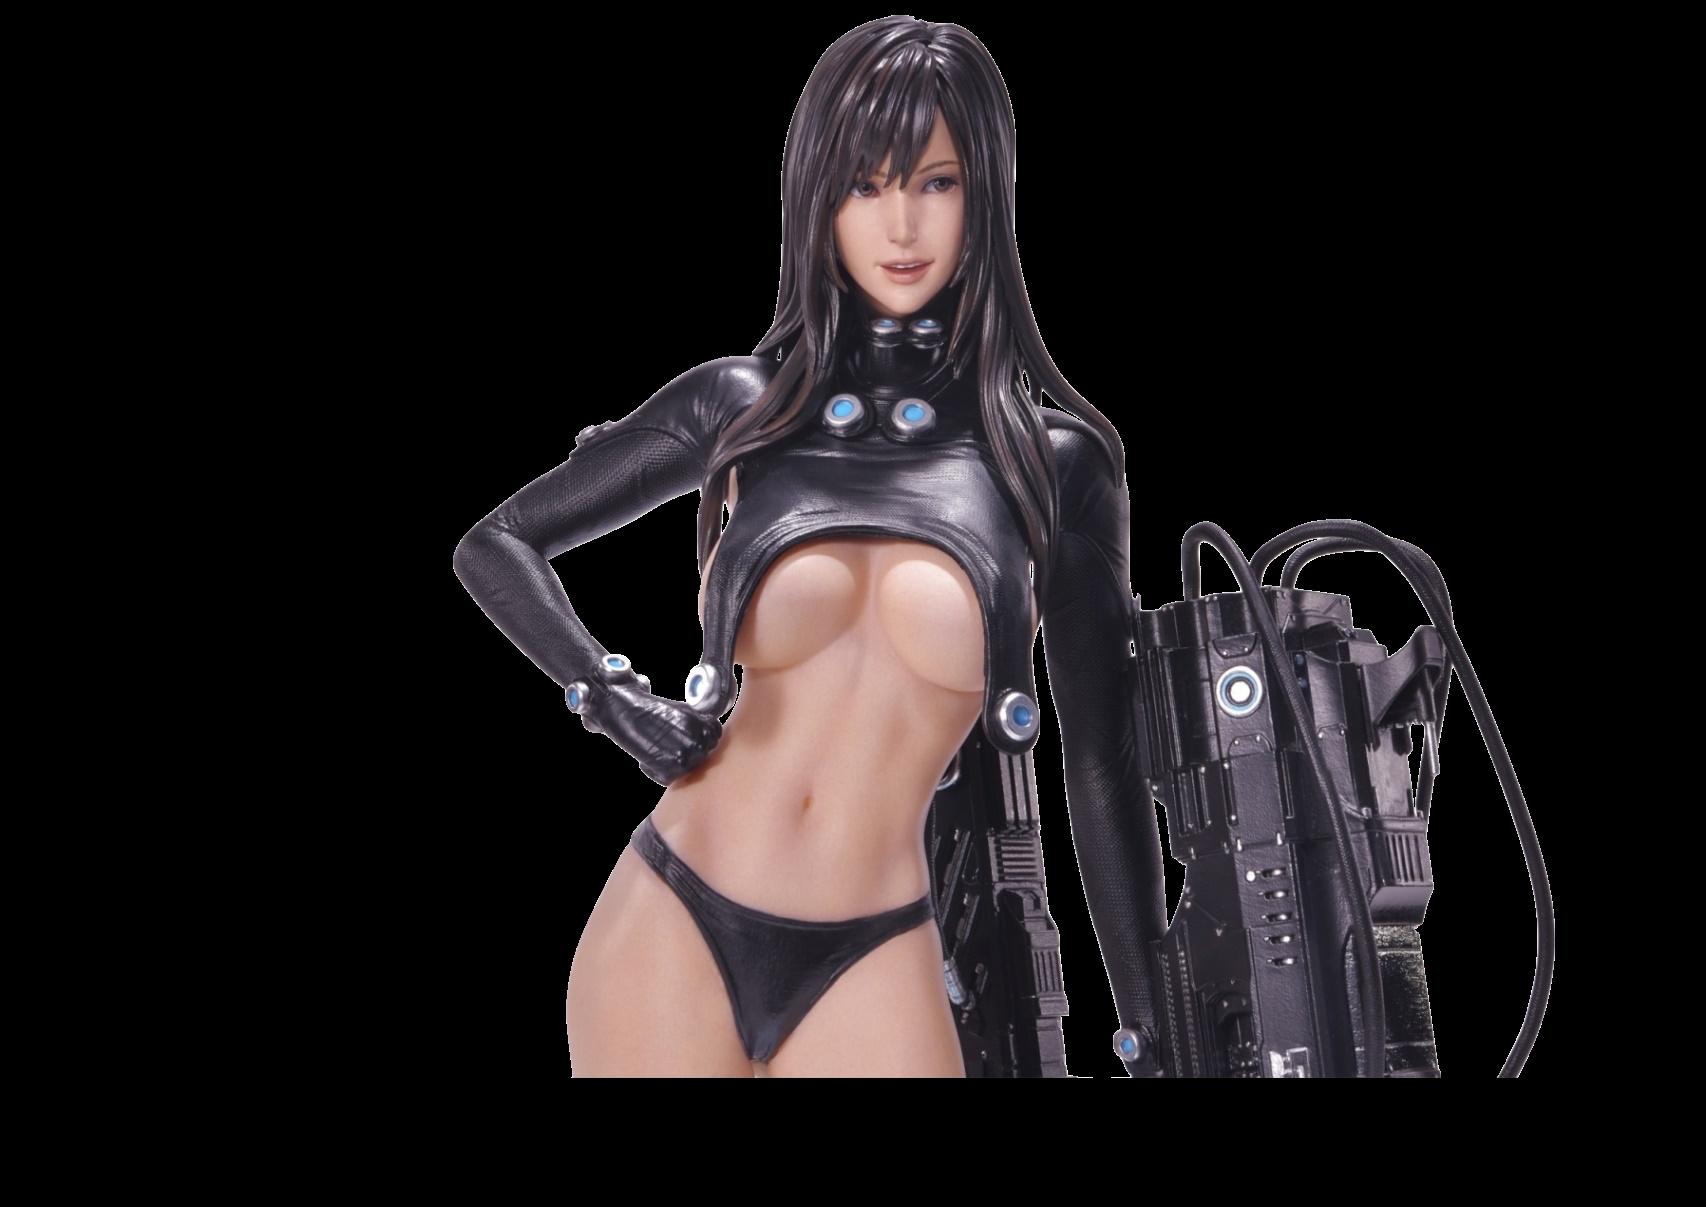 prime1-studio-gantz-reika-black-edition-1:4-statue-toyslife